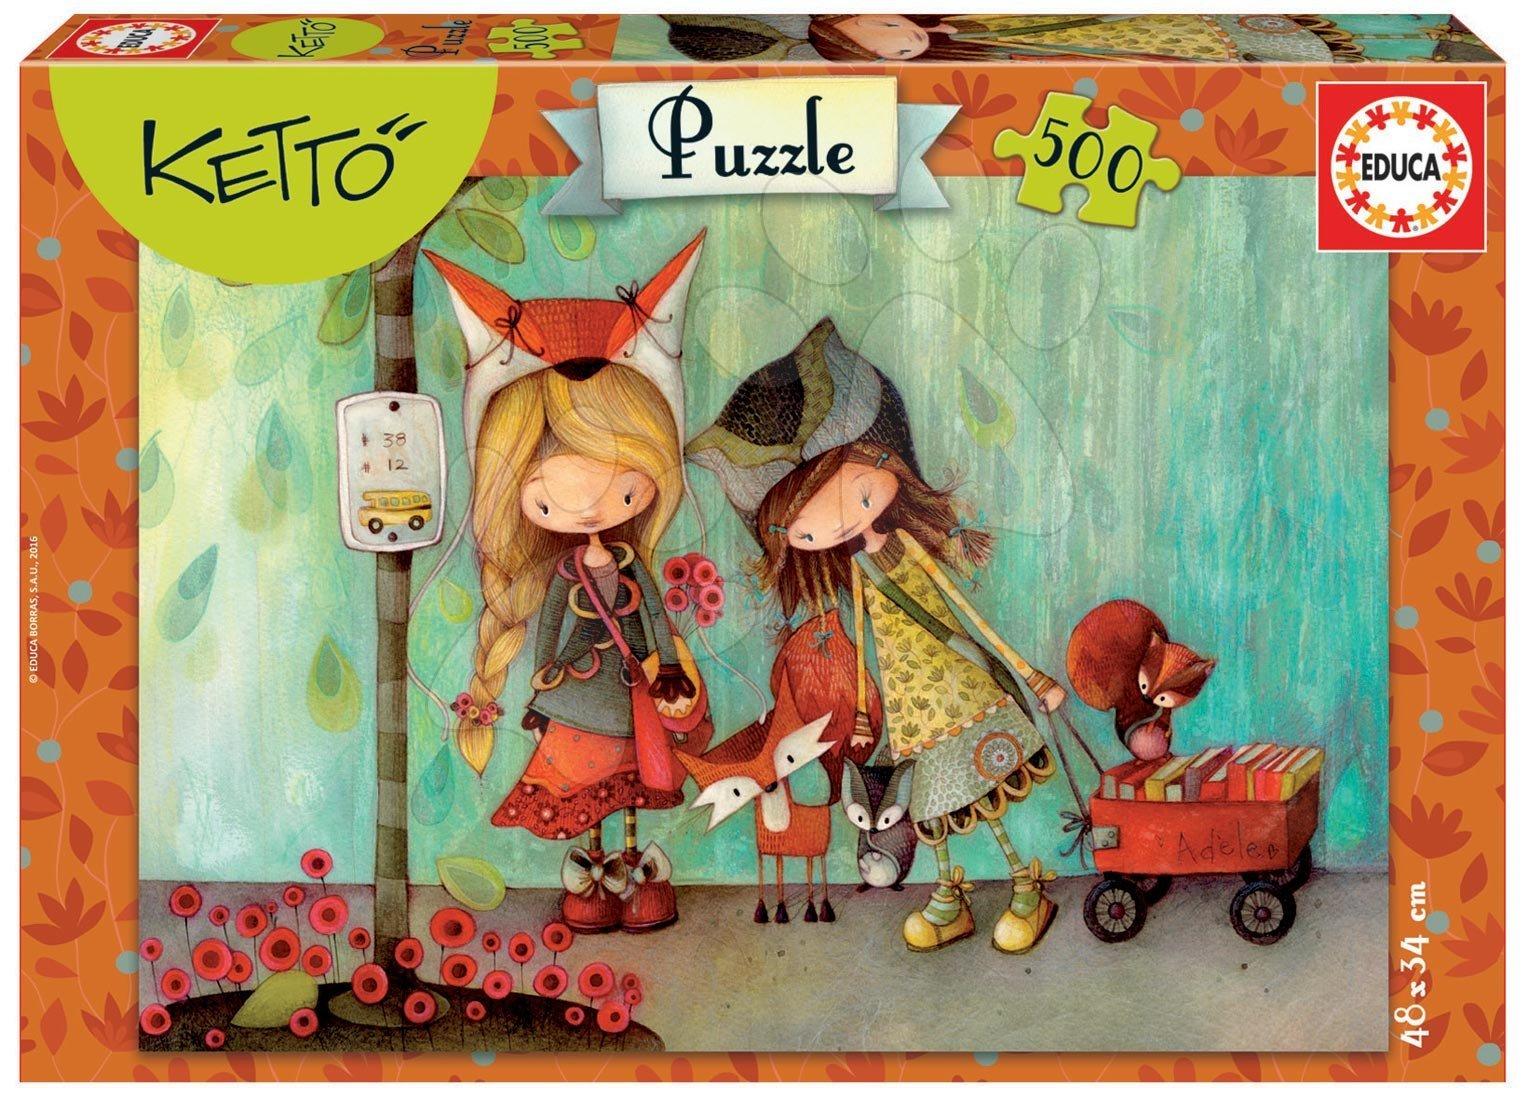 Puzzle 500 dielne - Puzzle Adele, Ketto Educa 500 dielov od 11 rokov